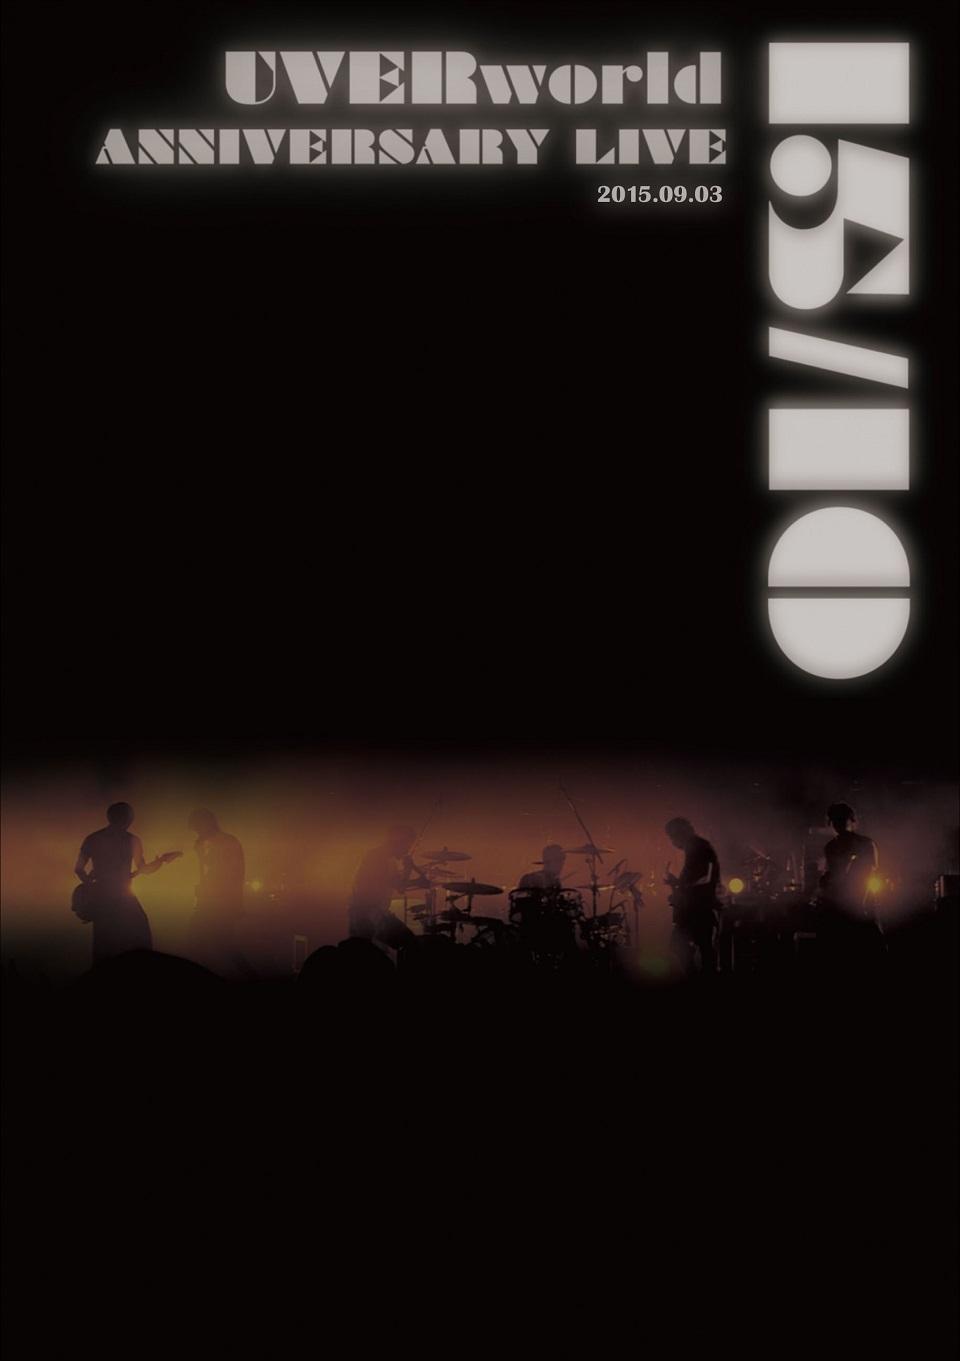 UVERworld 15&10 Anniversary Live 2015.09.03